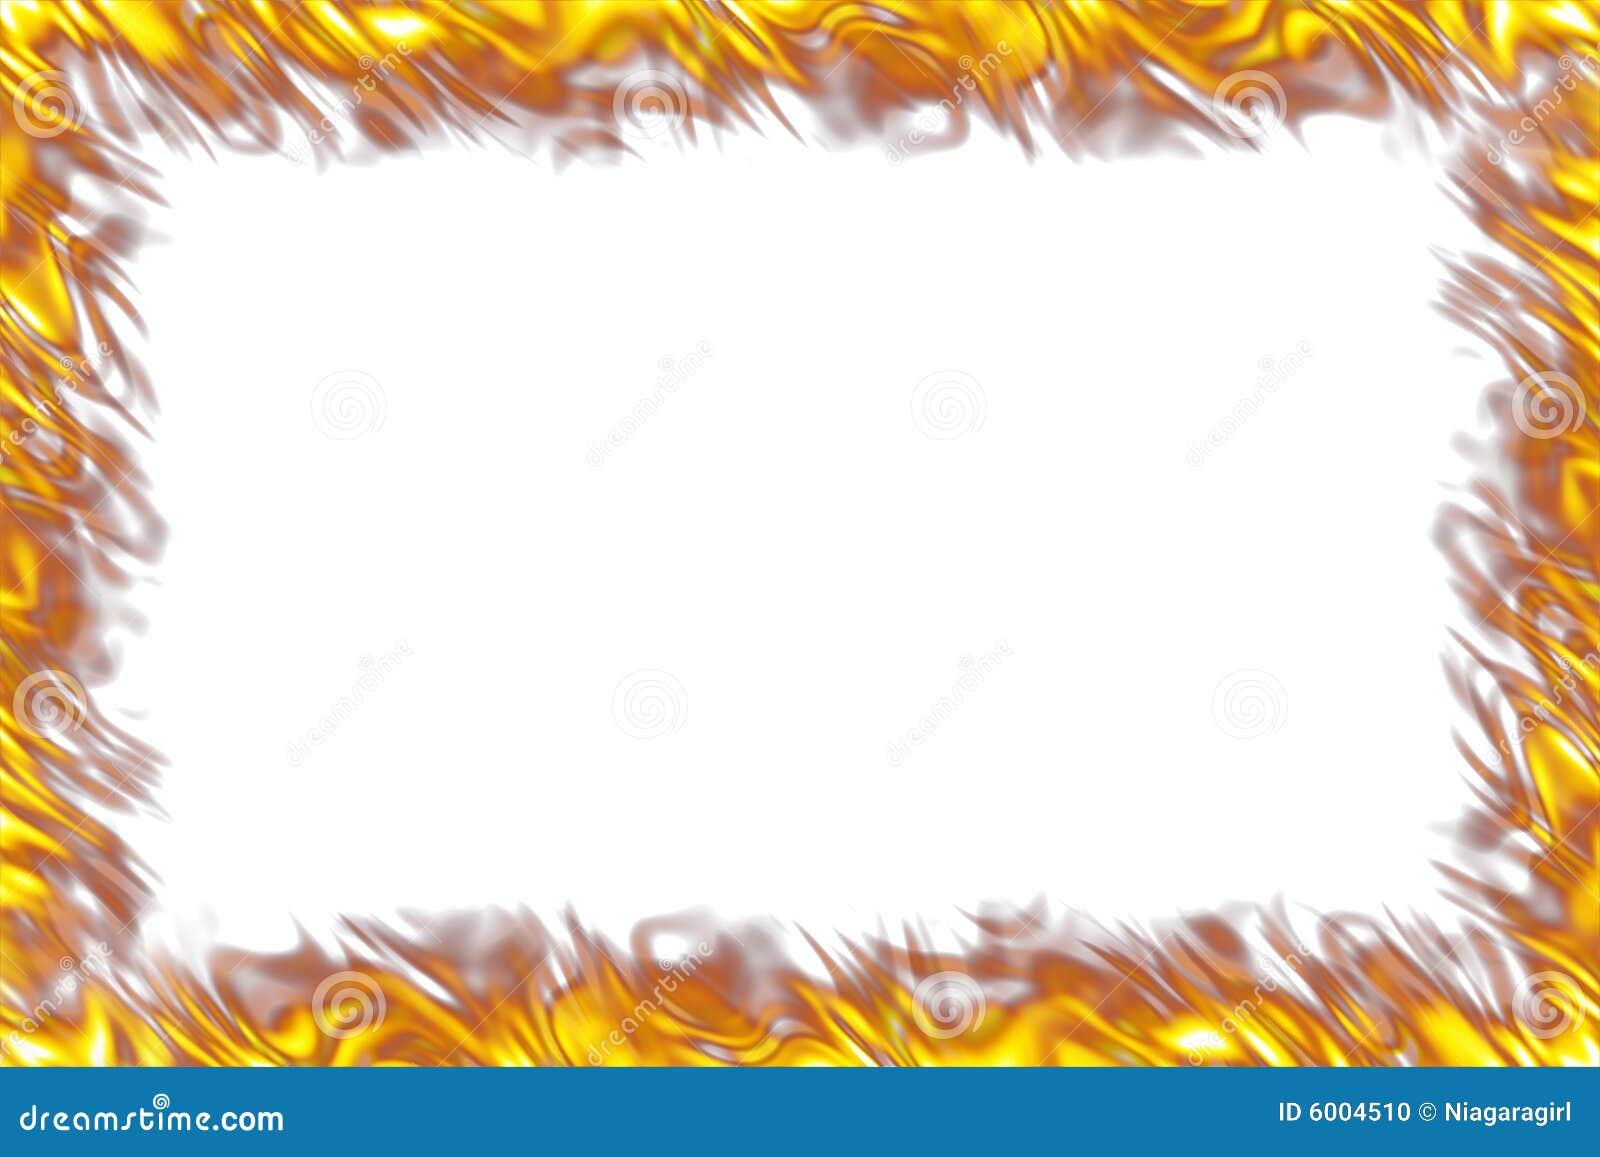 Flames Border On White Stock Photo - Image: 6004510